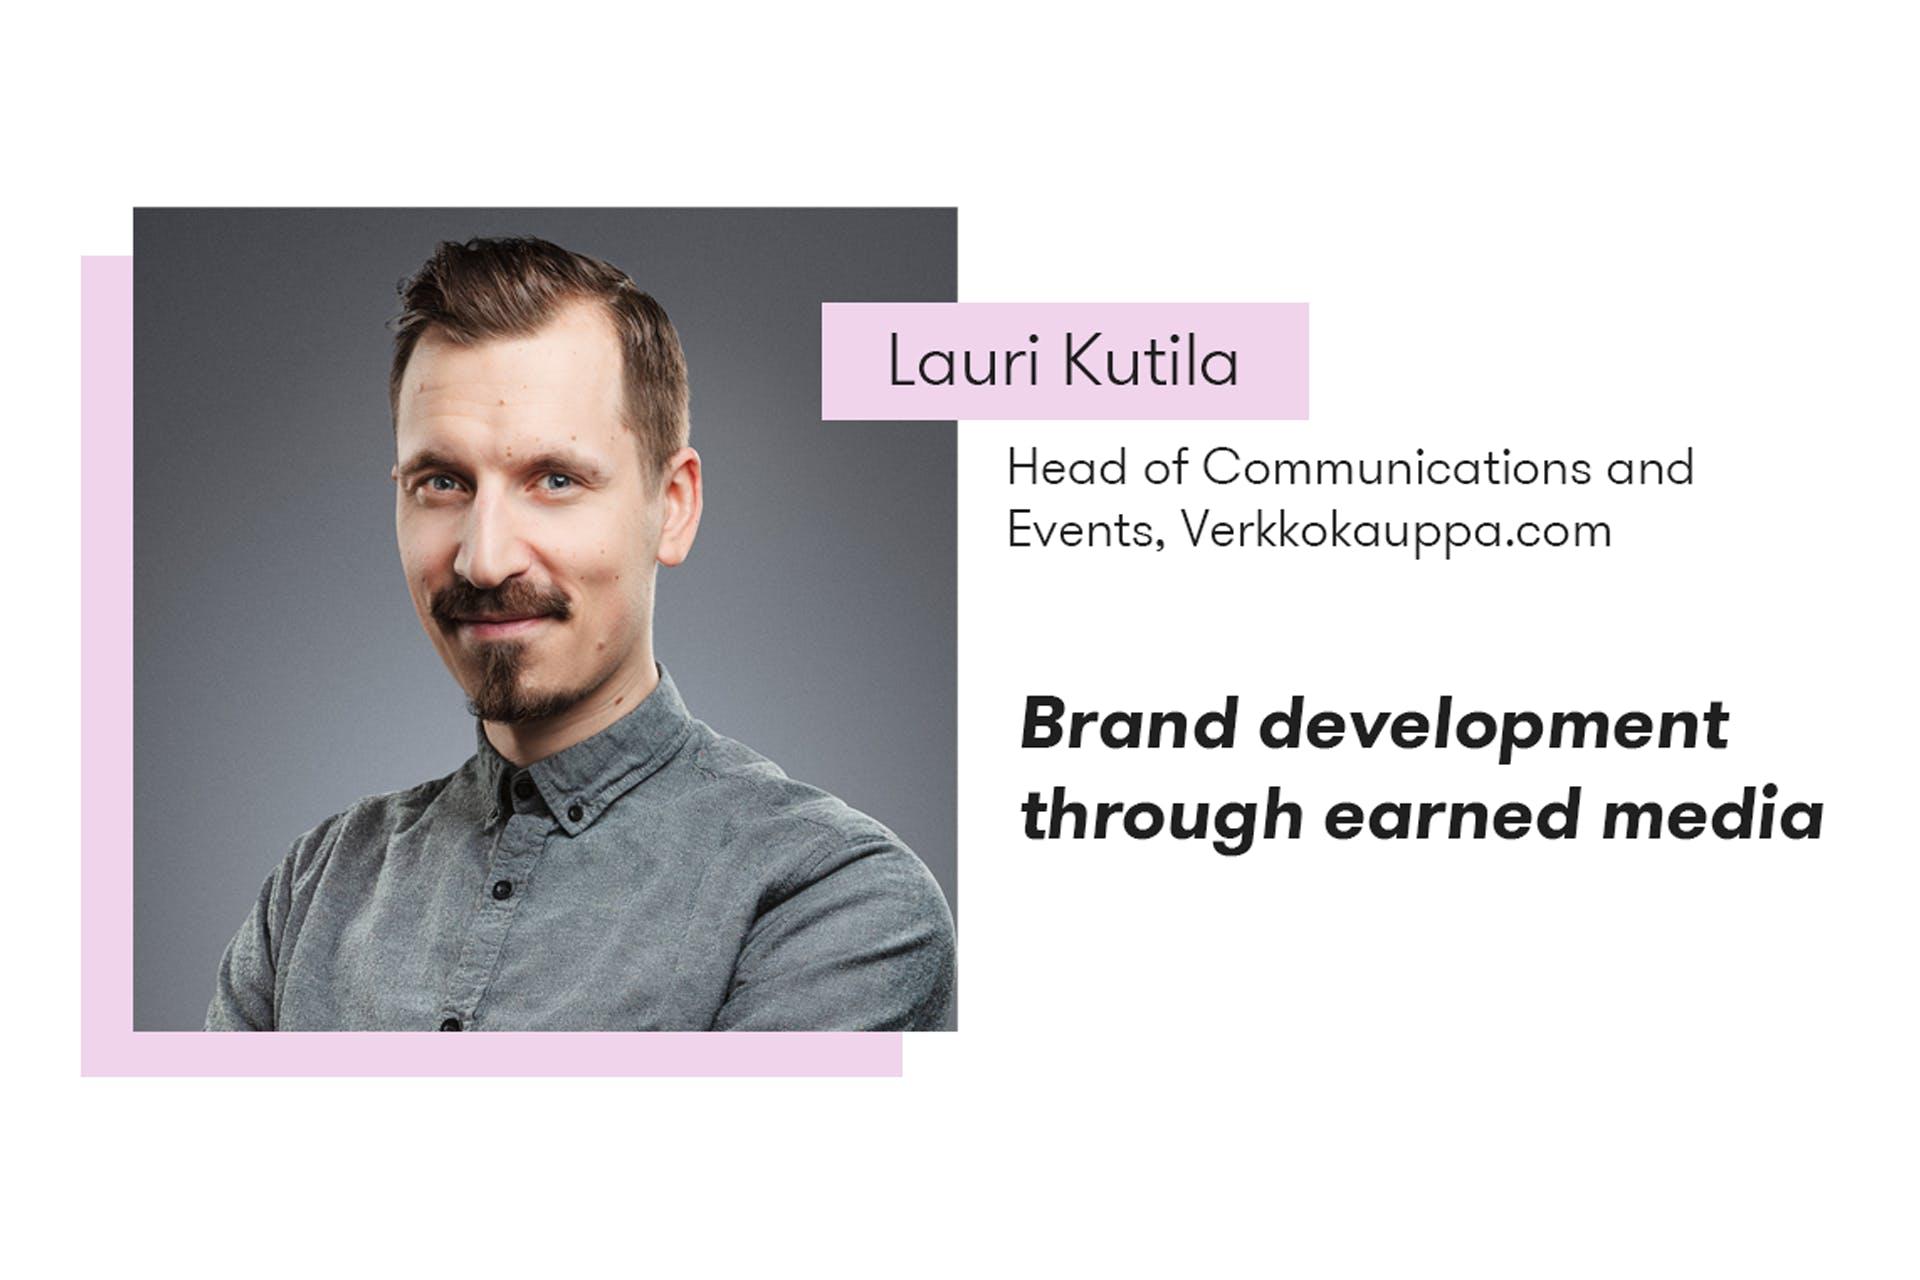 Lauri Kutila, Verkkokauppa.com